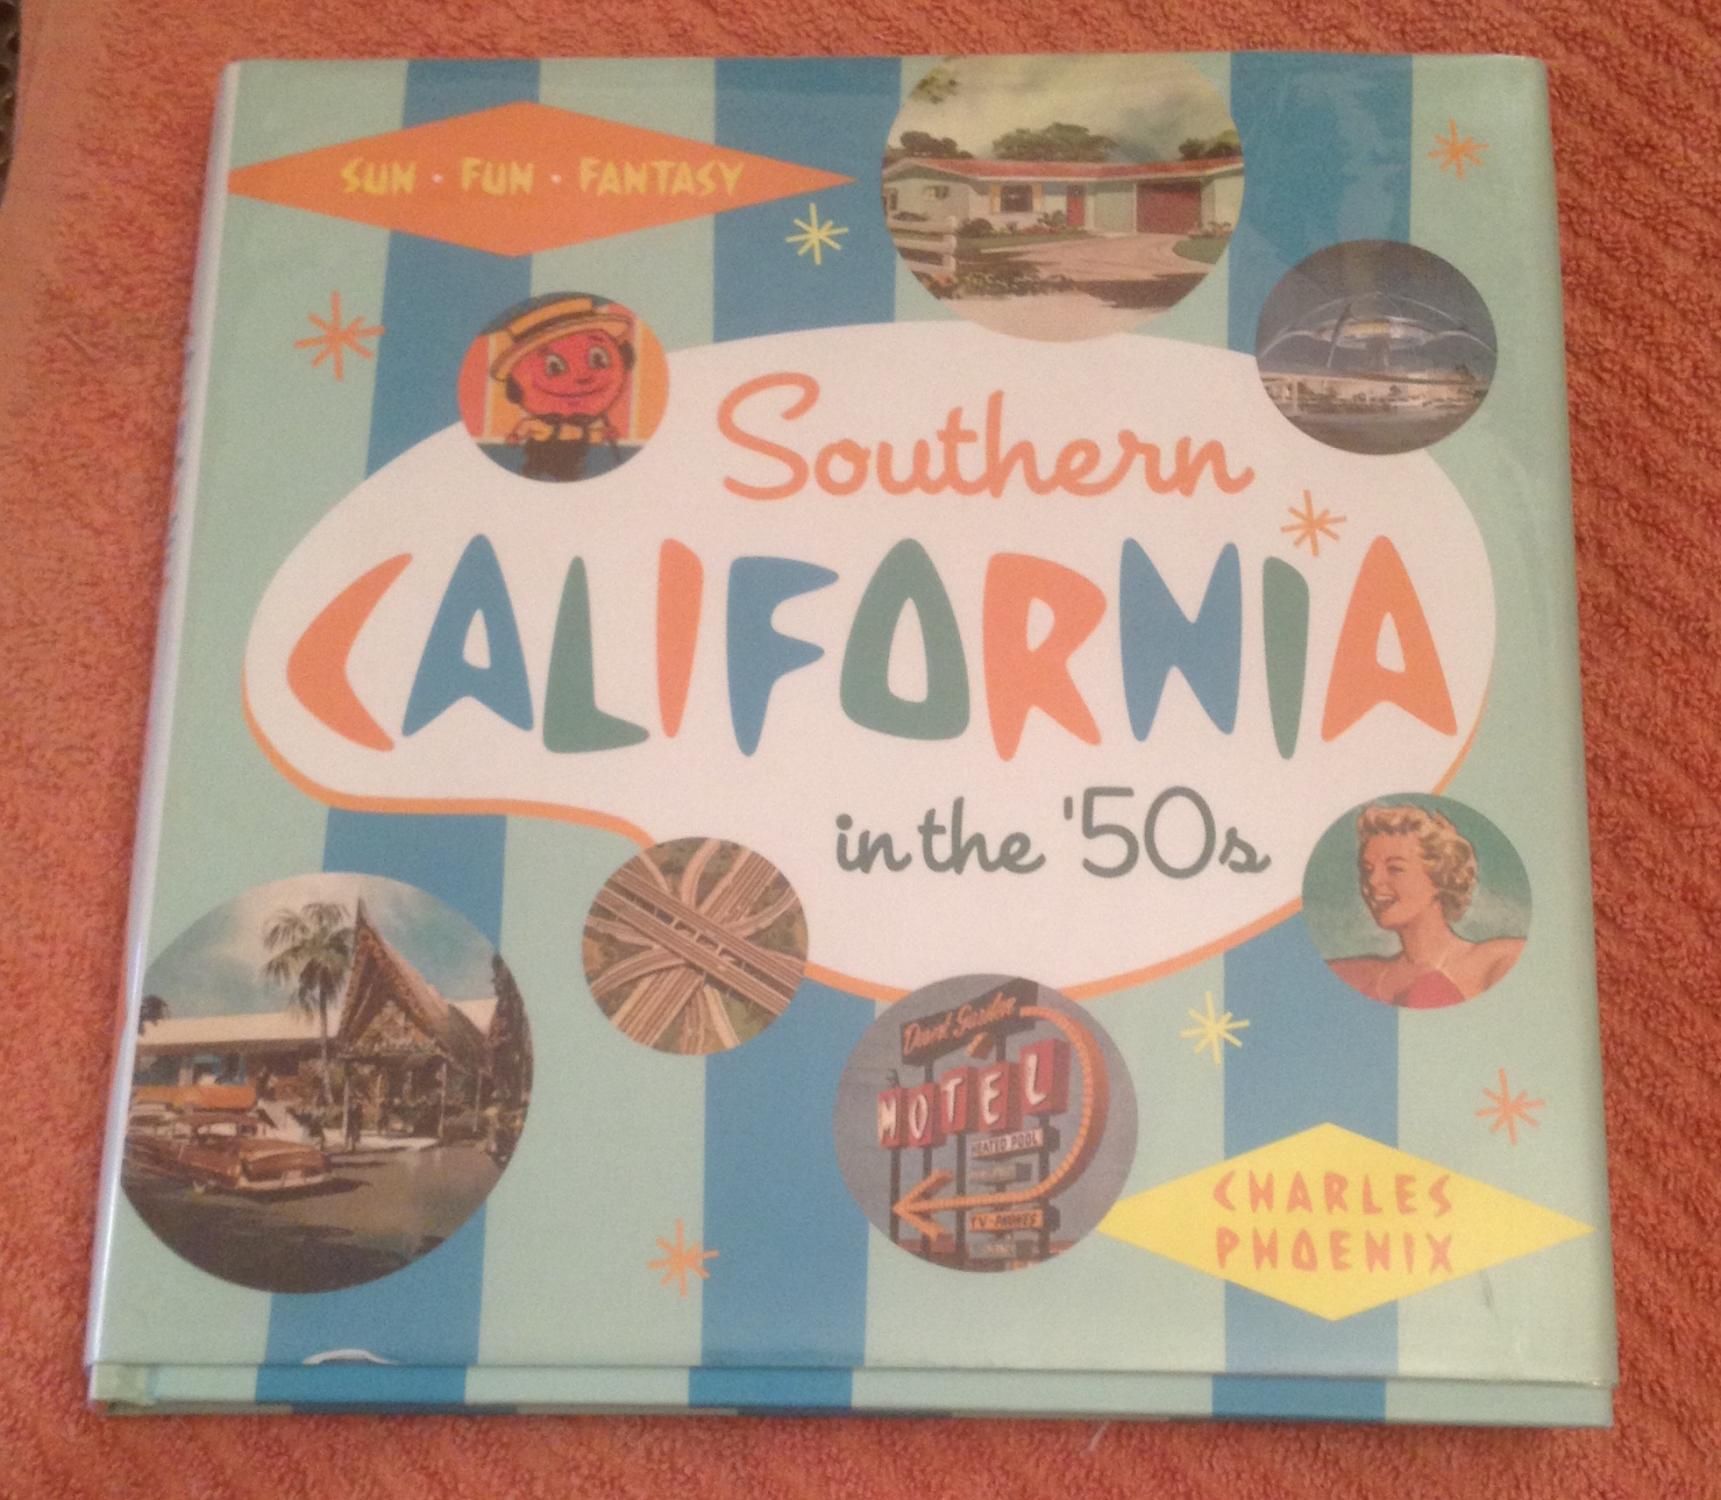 Sun Southern California in the 50s Fun and Fantasy